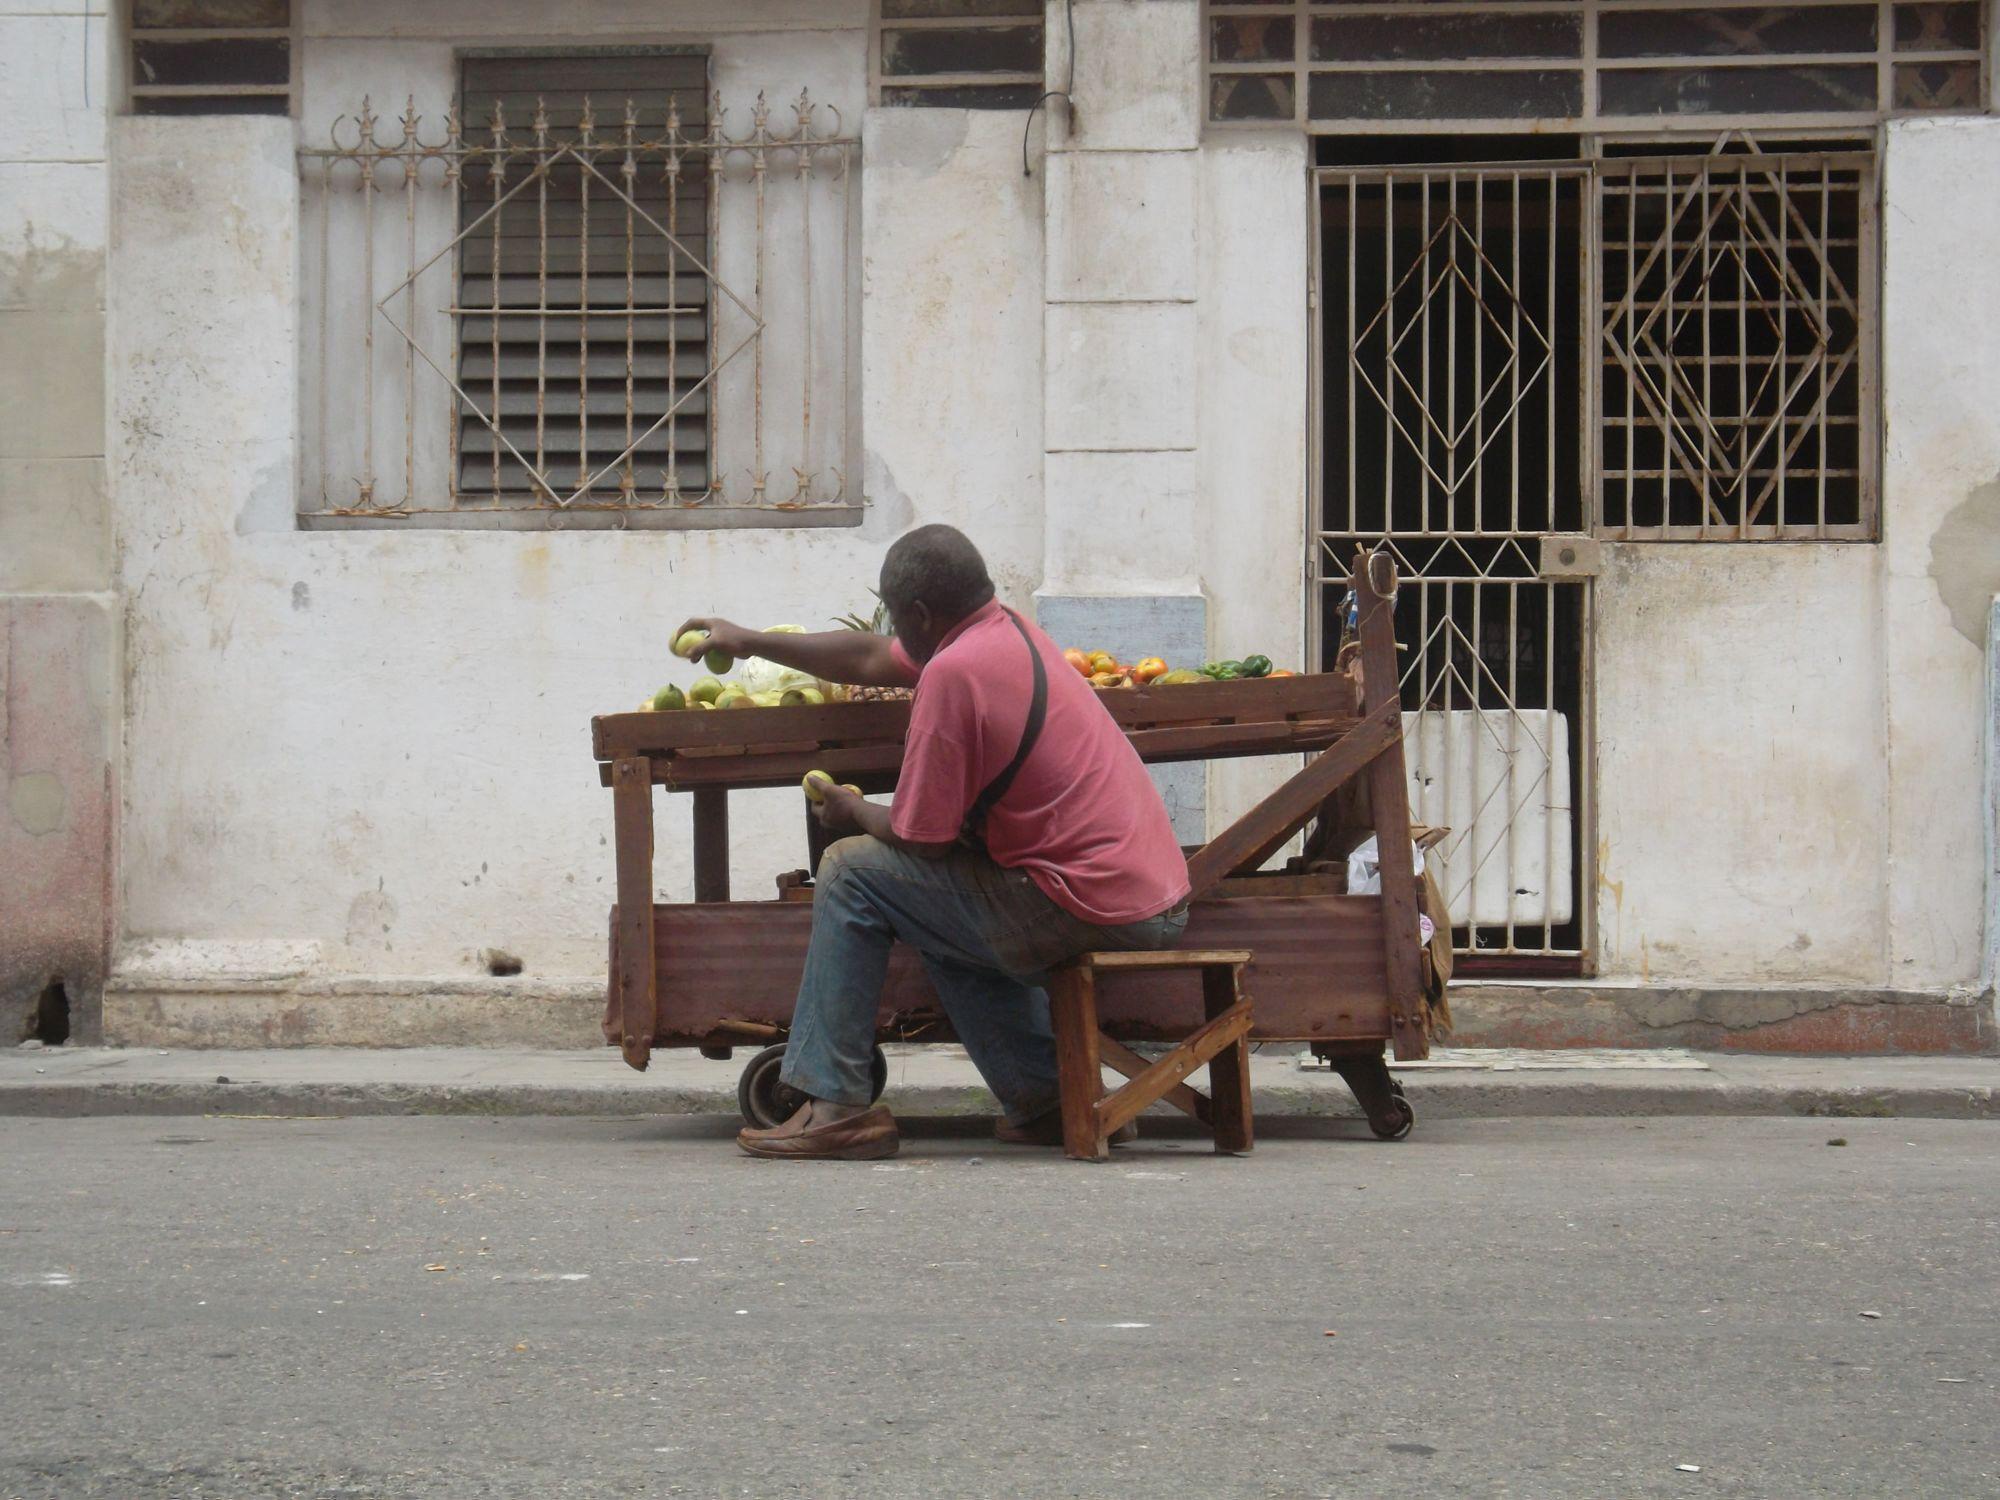 Zu verkaufen gibts immer noch nicht viel. Foto: D. Ossami